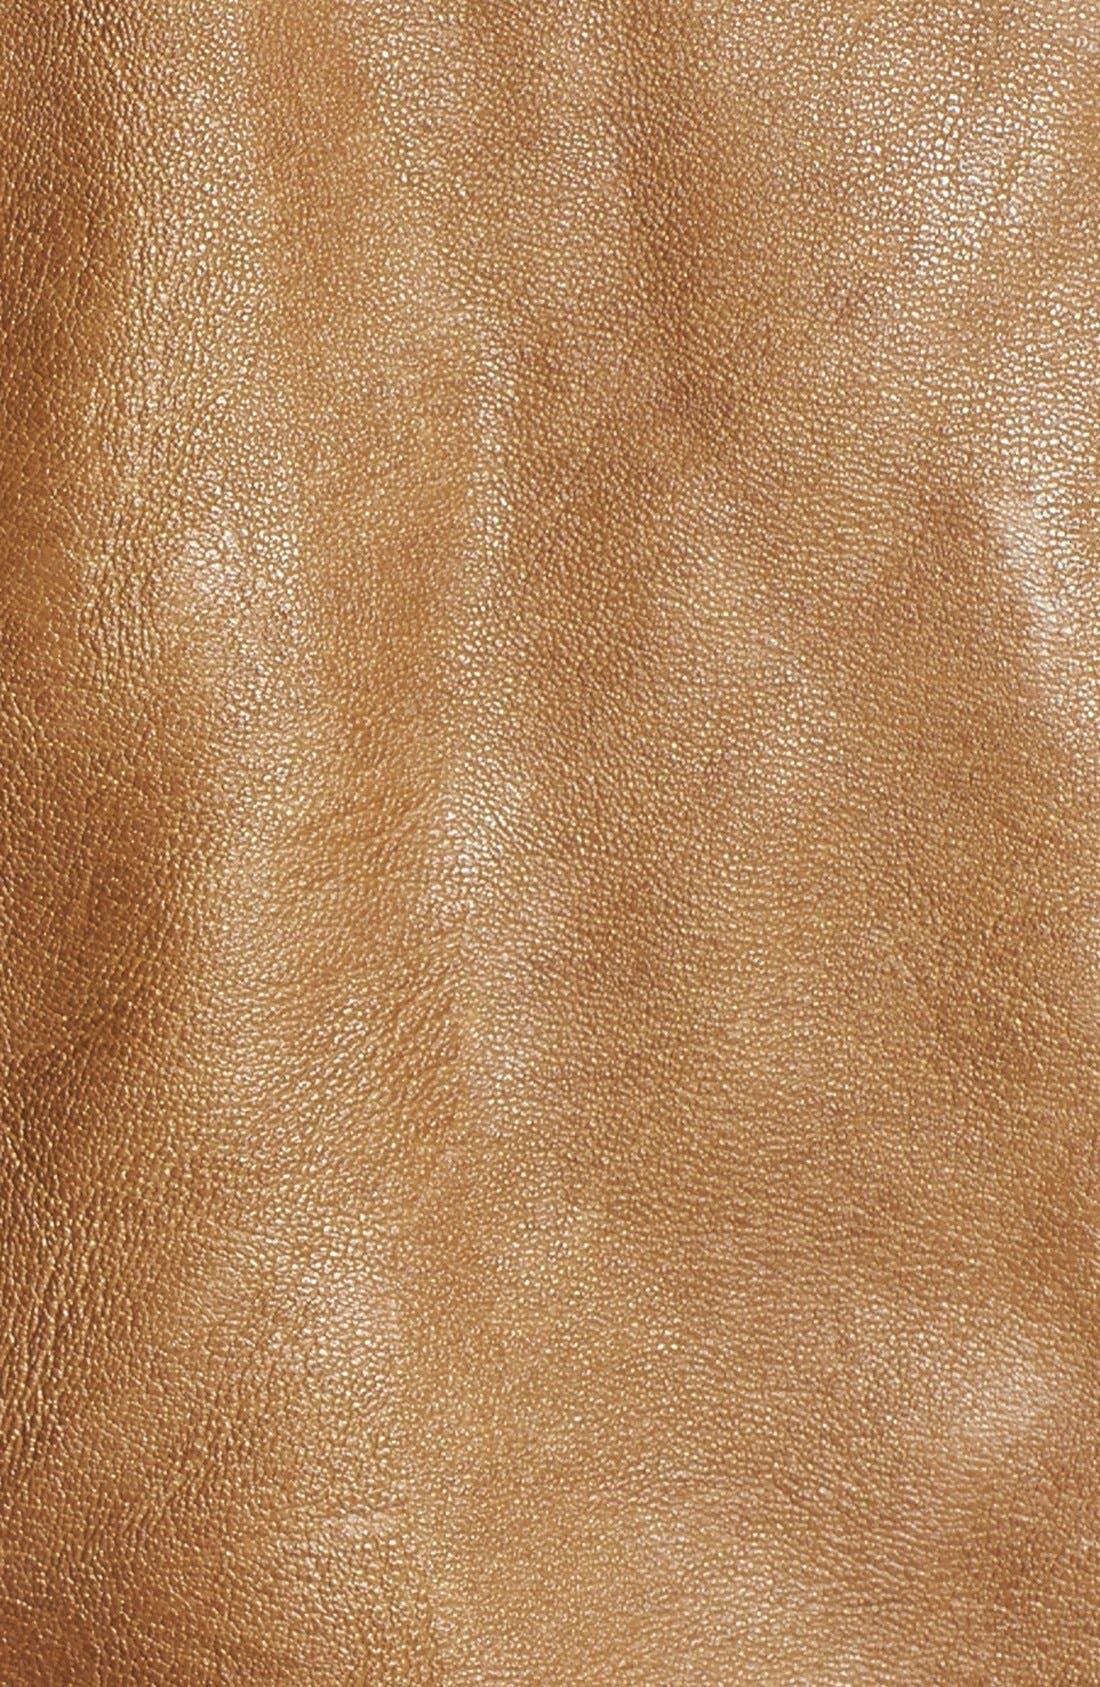 Alternate Image 3  - BB Dakota 'Janeen' Faux Leather Moto Jacket (Plus Size)